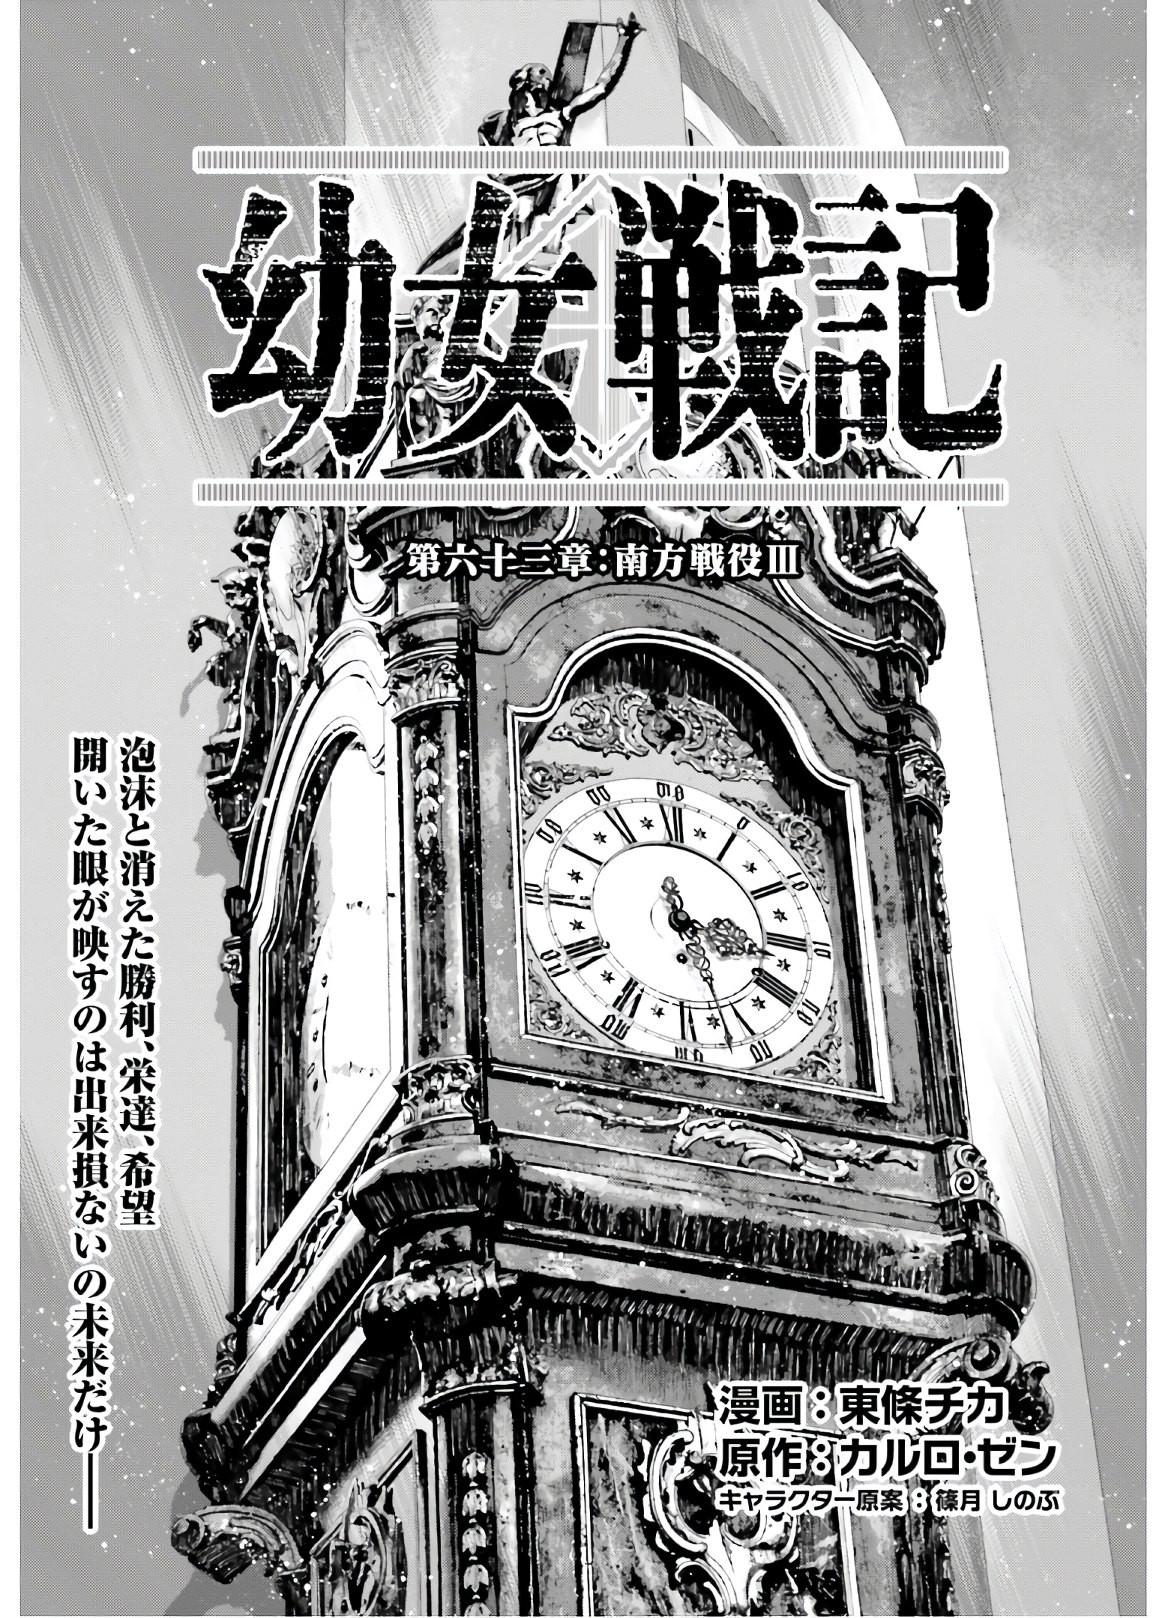 Youjo Senki - Chapter 63 - Page 1